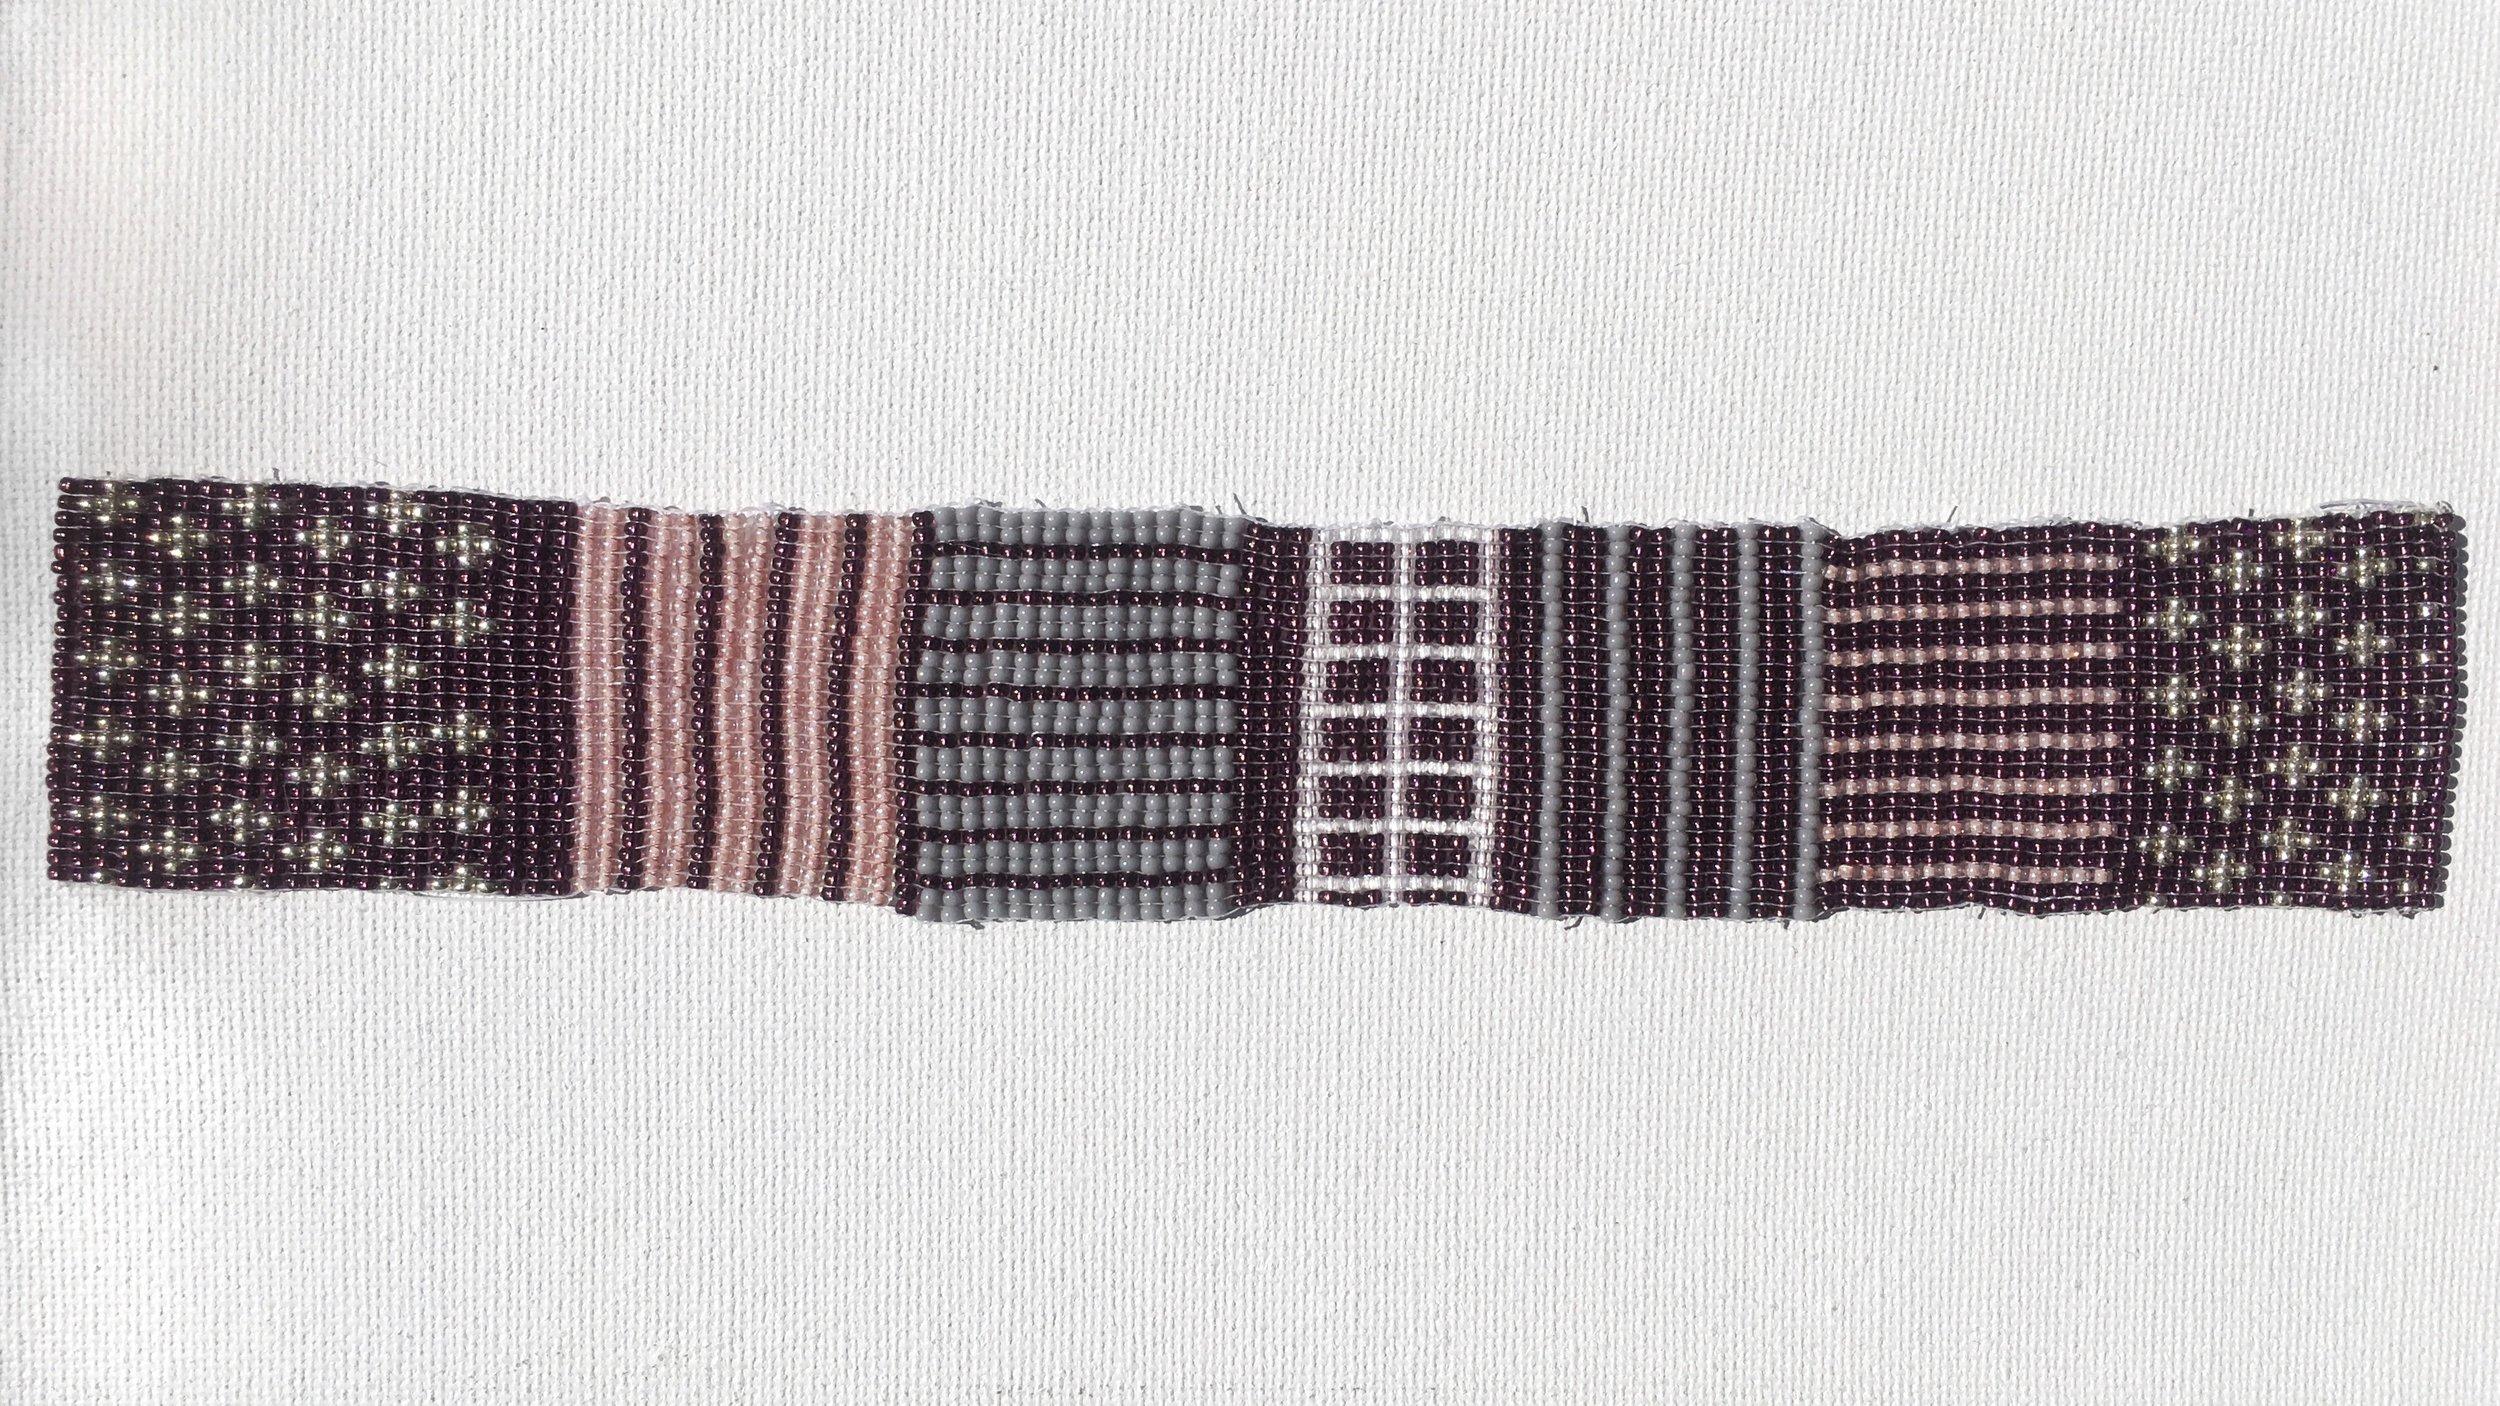 Bead Weaving on Canvas